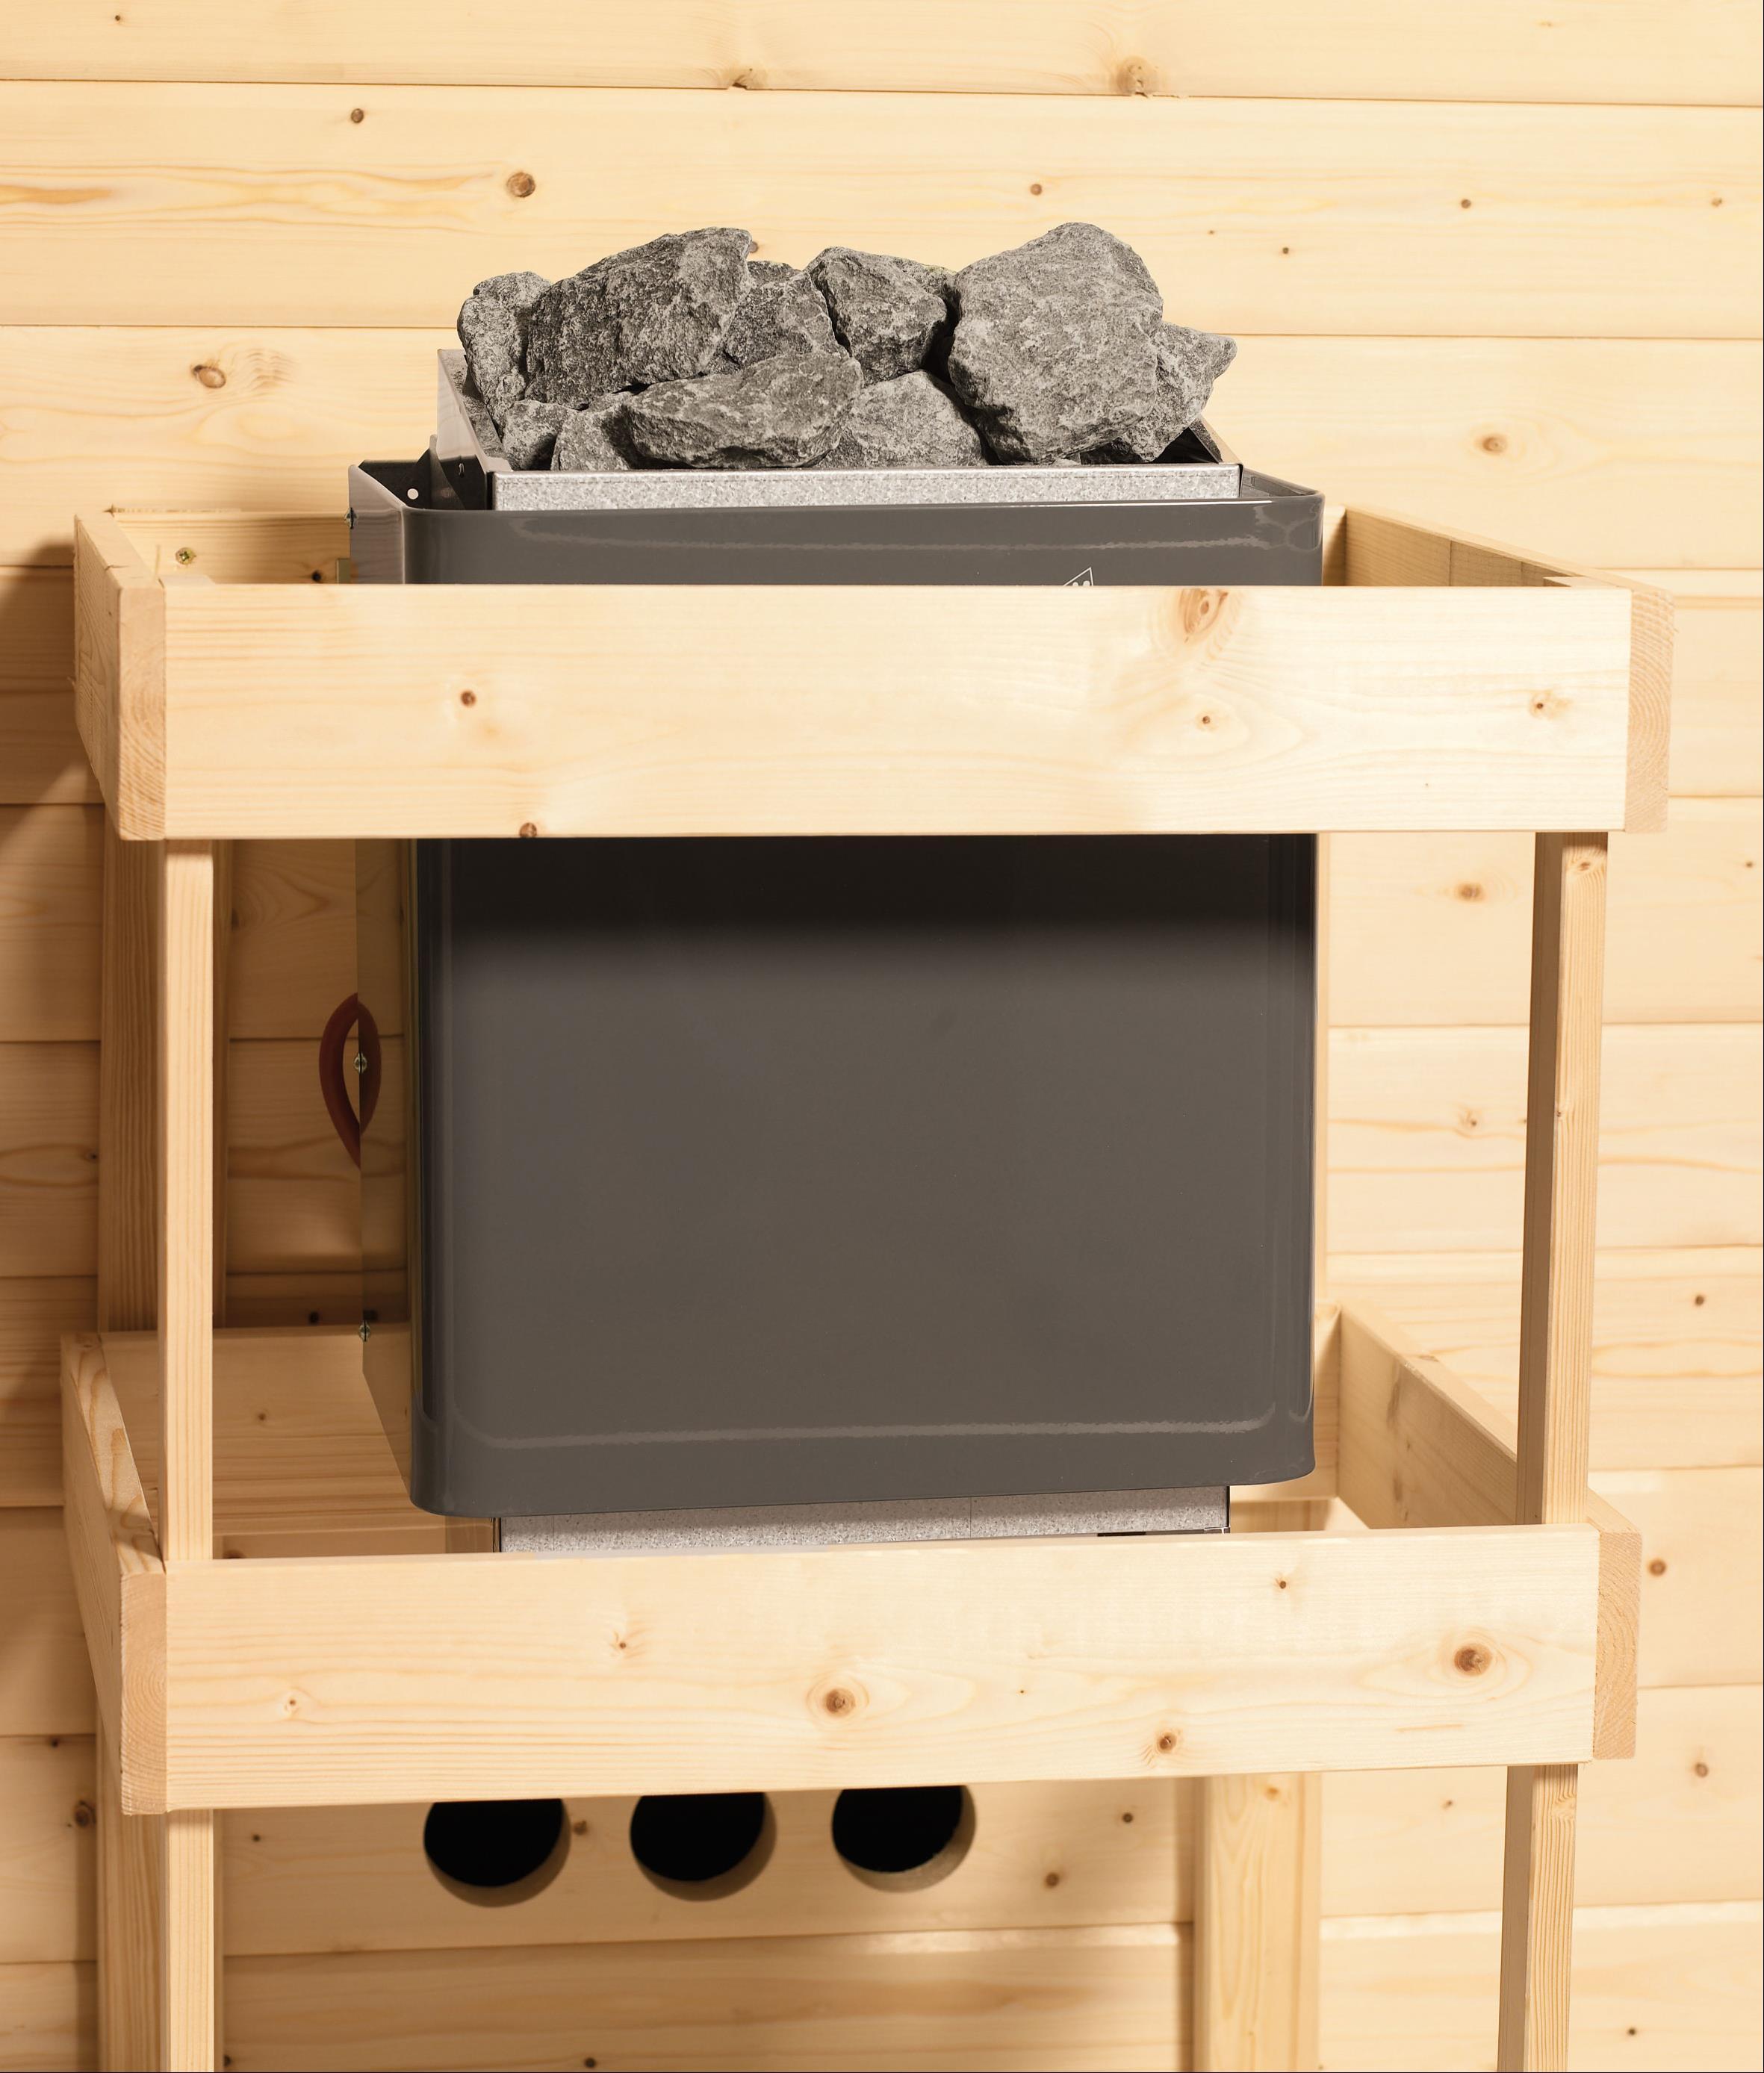 Woodfeeling Sauna Karla 38mm Kranz Ofen 9kW intern Tür Classic Bild 8